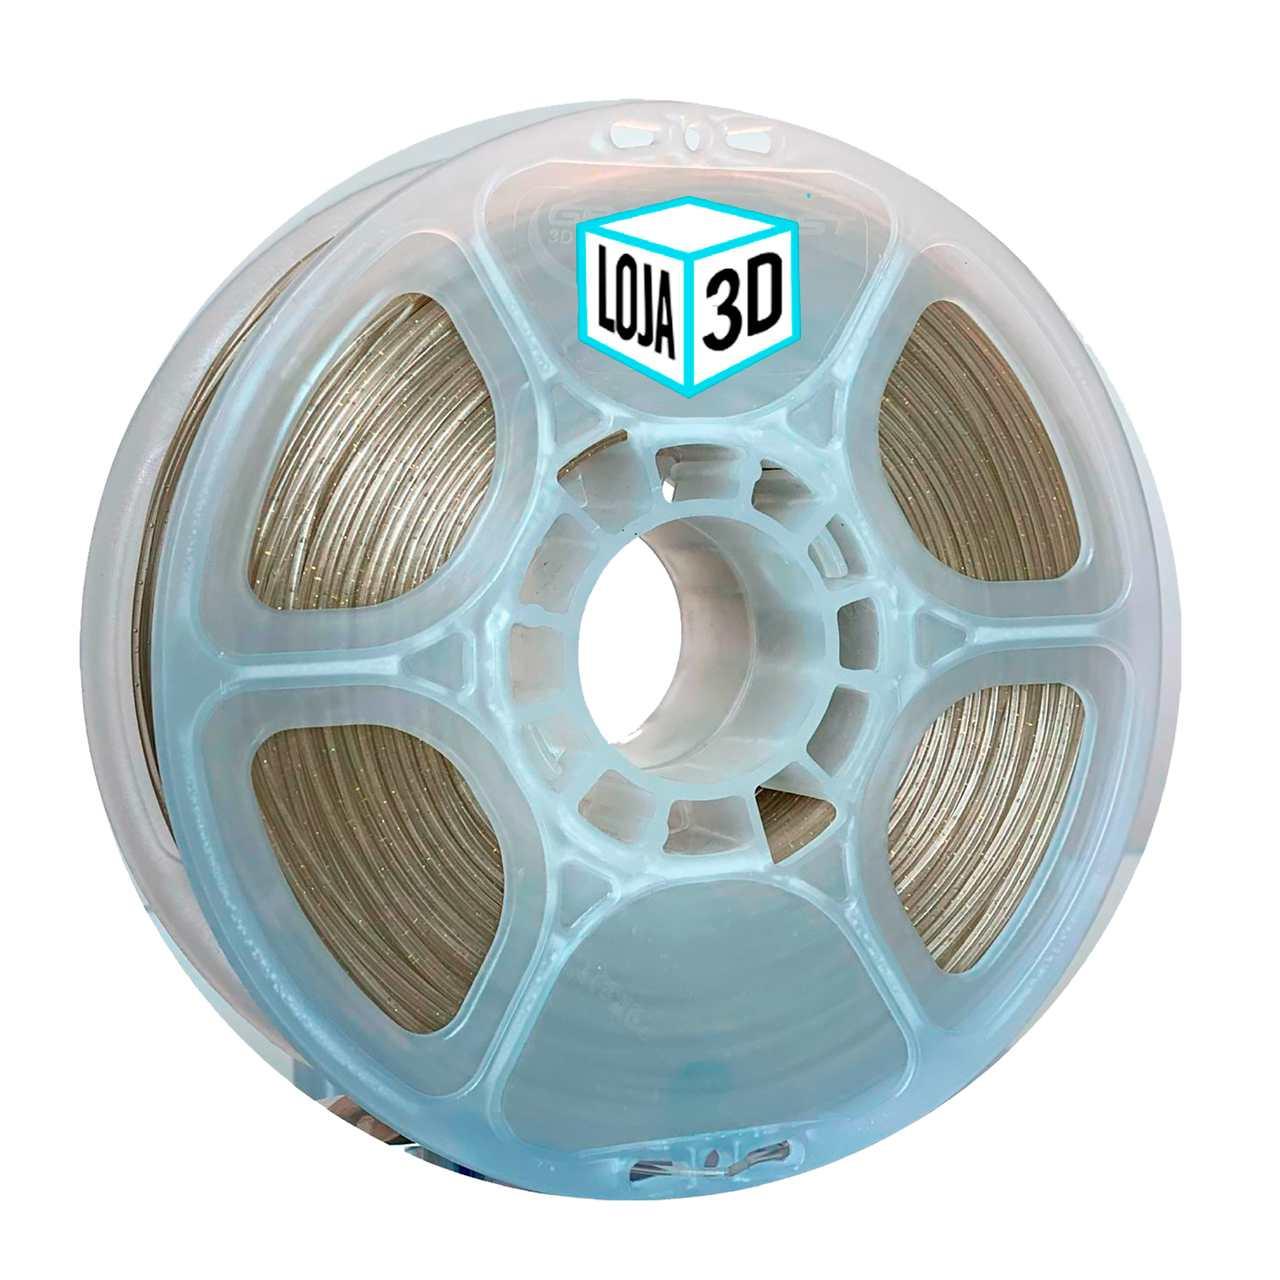 Filamento PLA Pro de Alta Resistência - Natural Translúcido com Glitter - Loja 3D - 1.75mm - 1kg